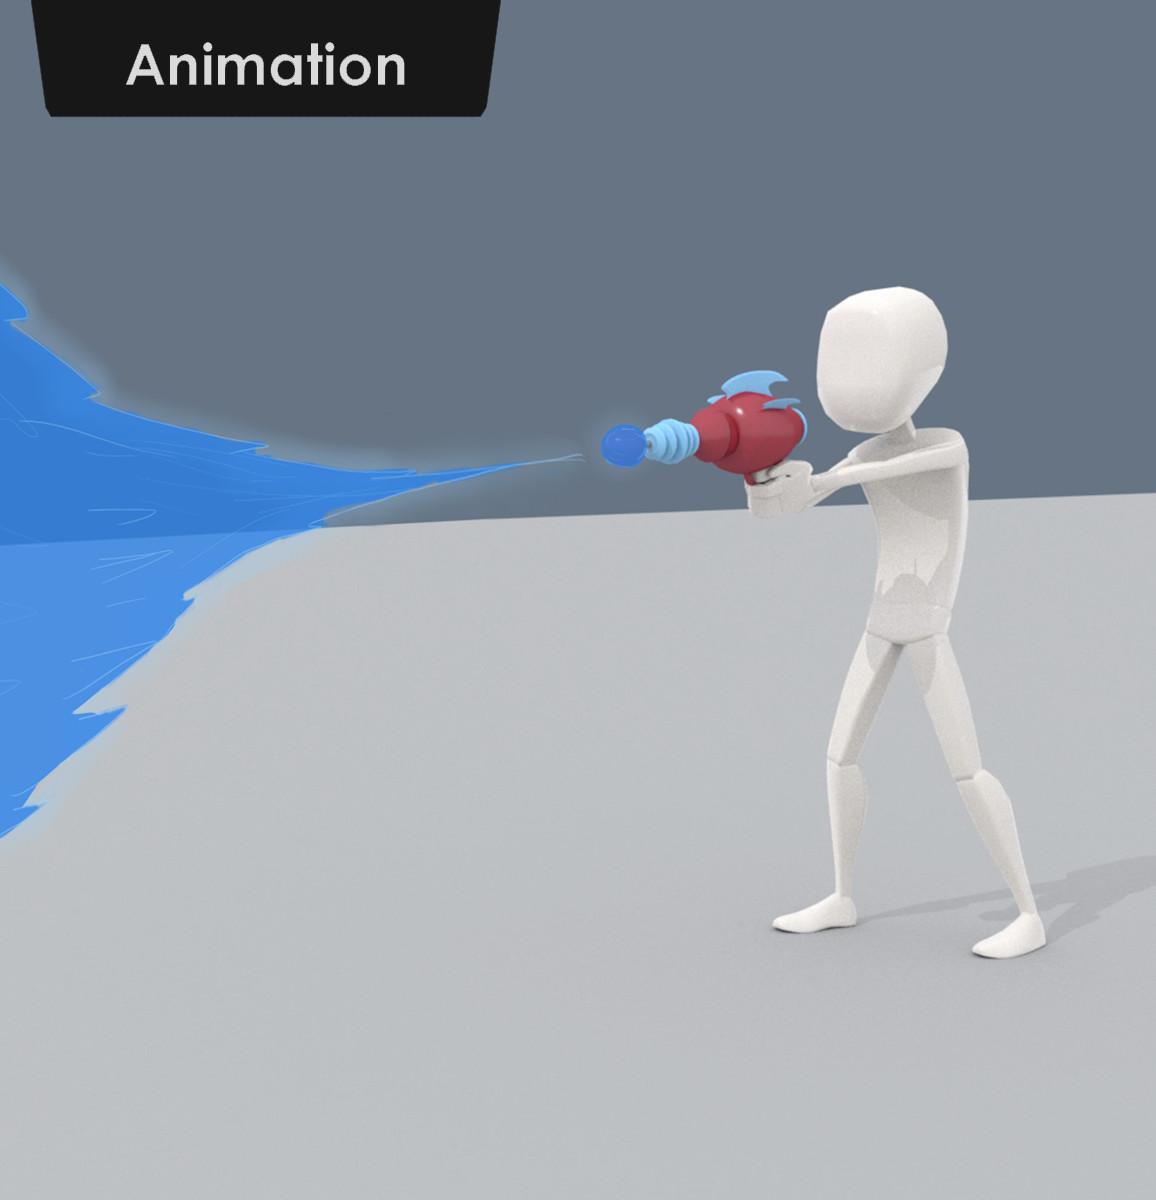 Laser Blast Animation